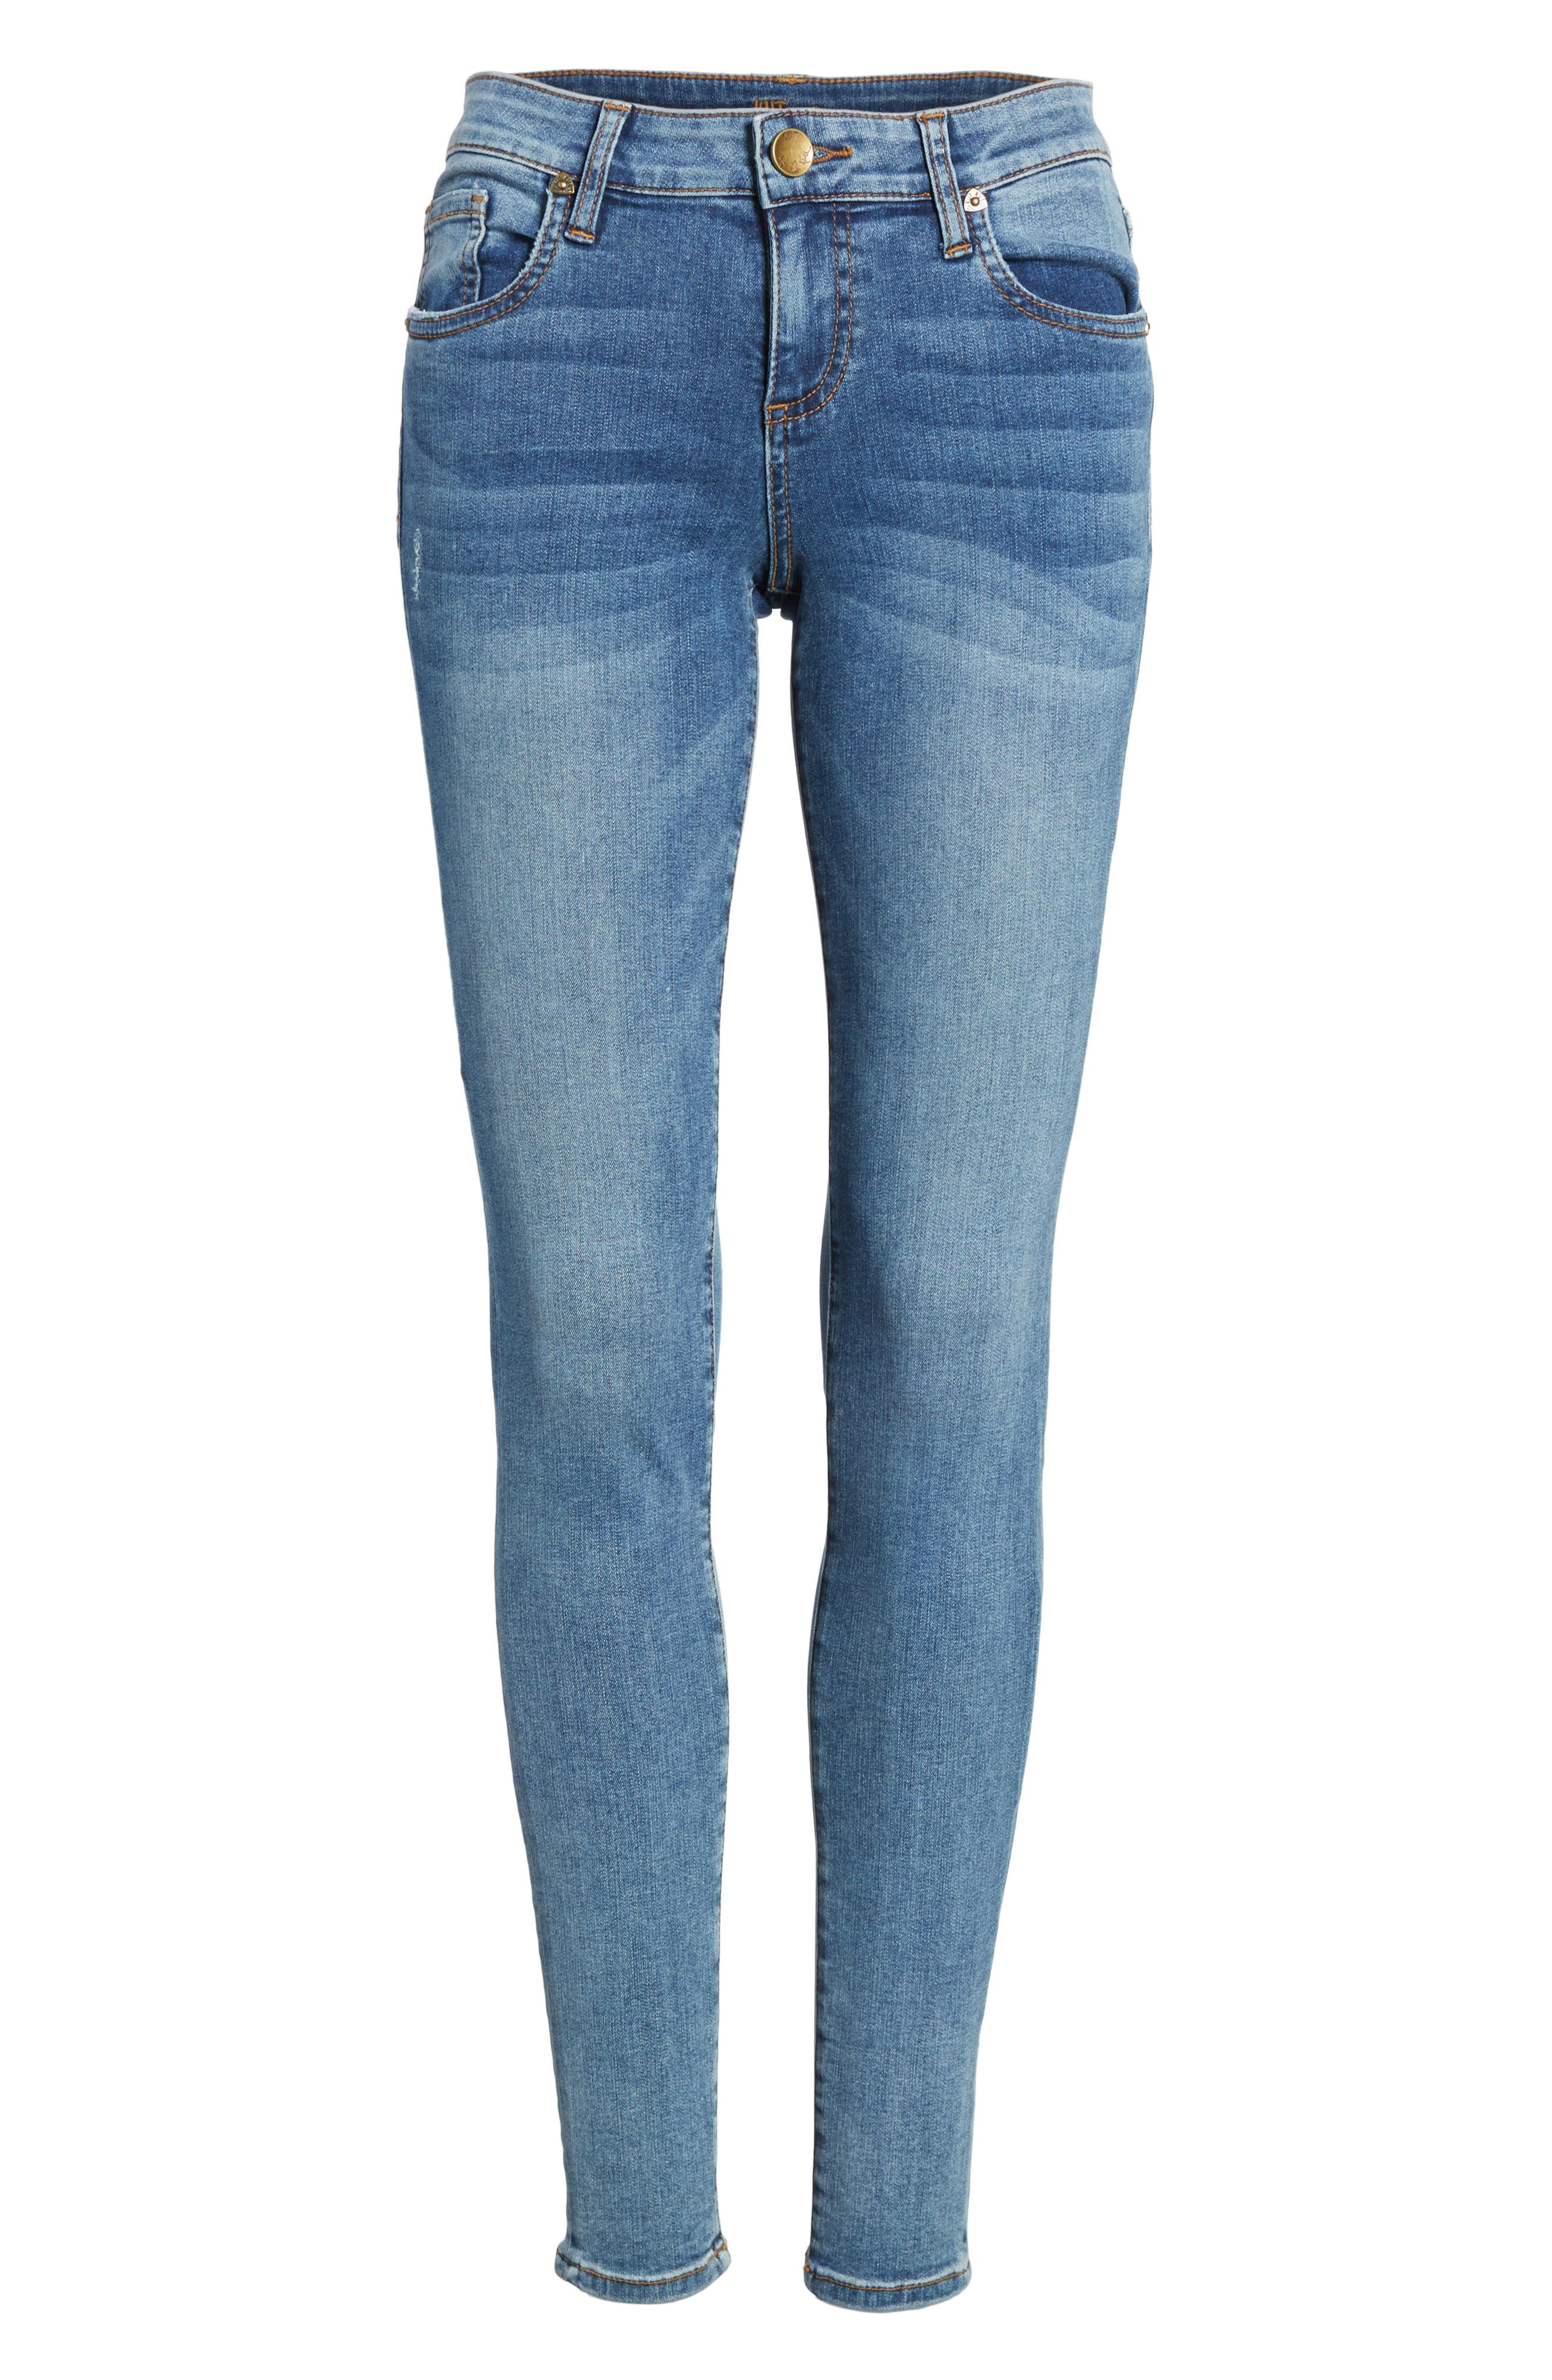 Donna Skinny Jeans,                             Alternate thumbnail 6, color,                             426